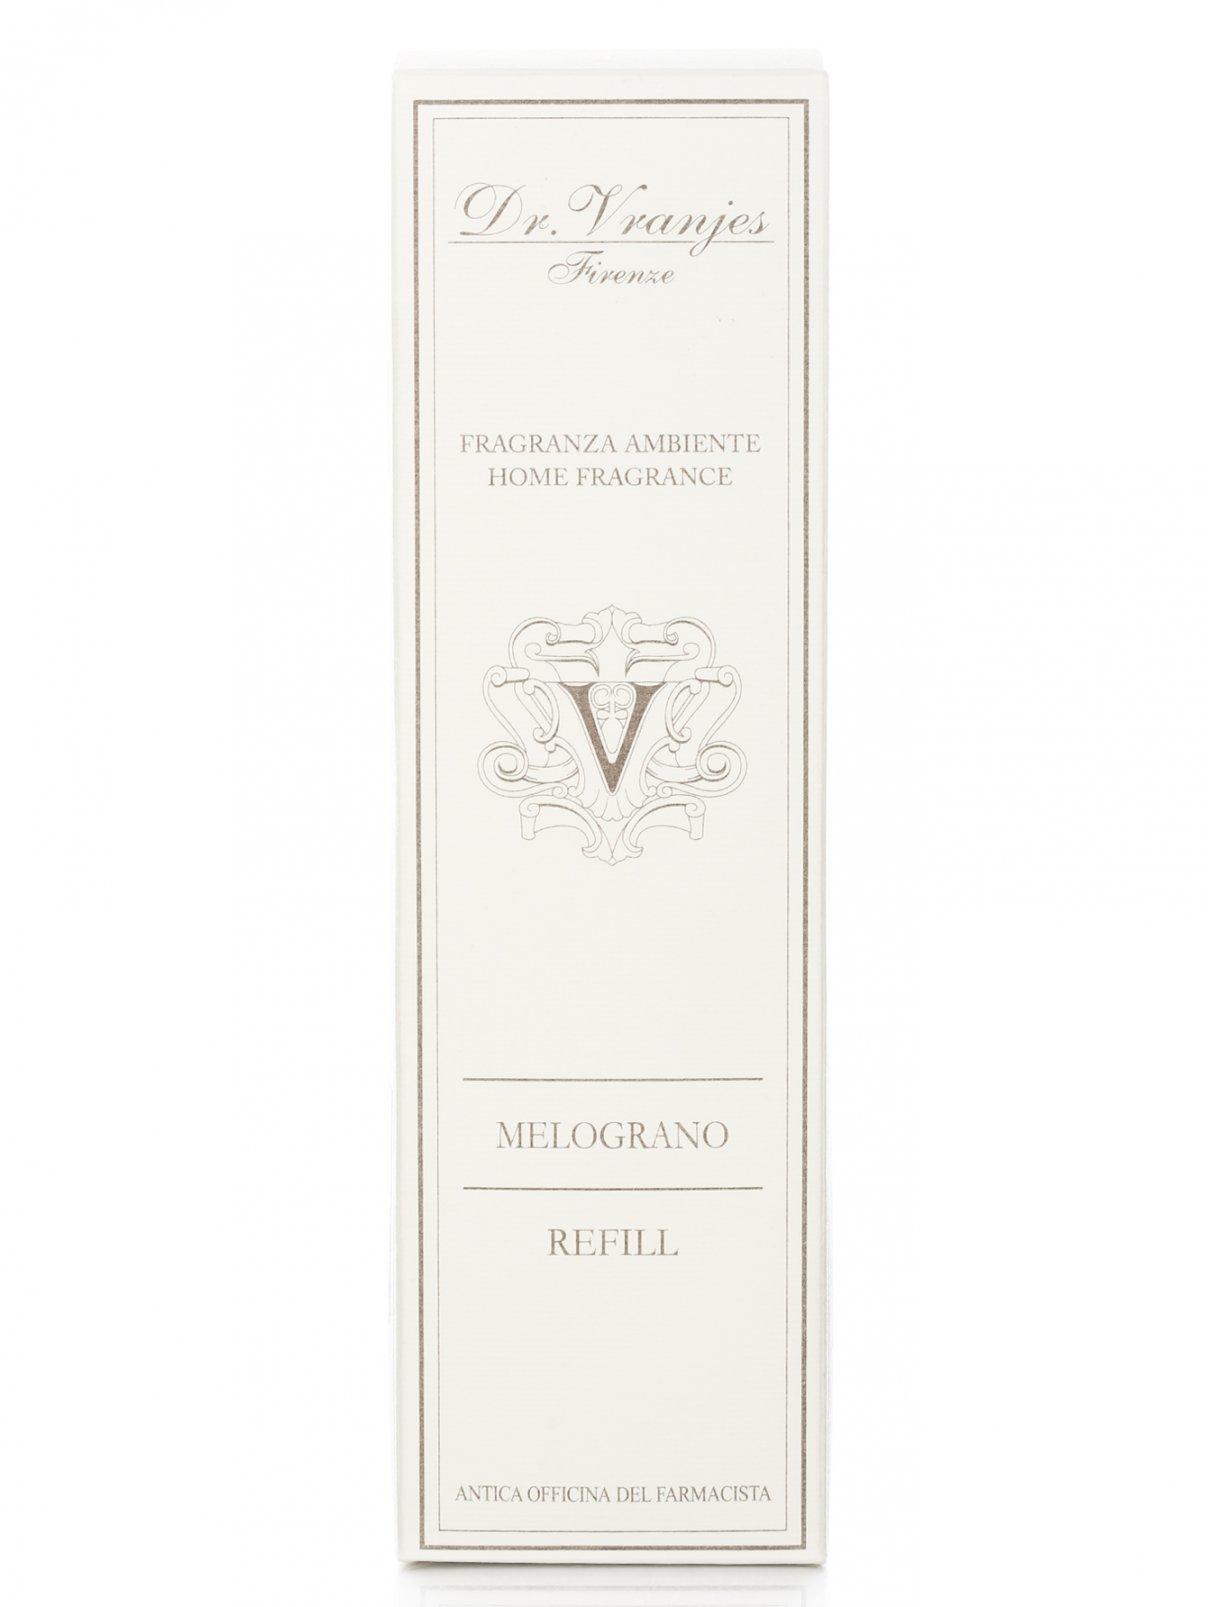 Наполнитель для диффузора Melograno - Home Fragrance, 500ml Dr. Vranjes  –  Модель Общий вид